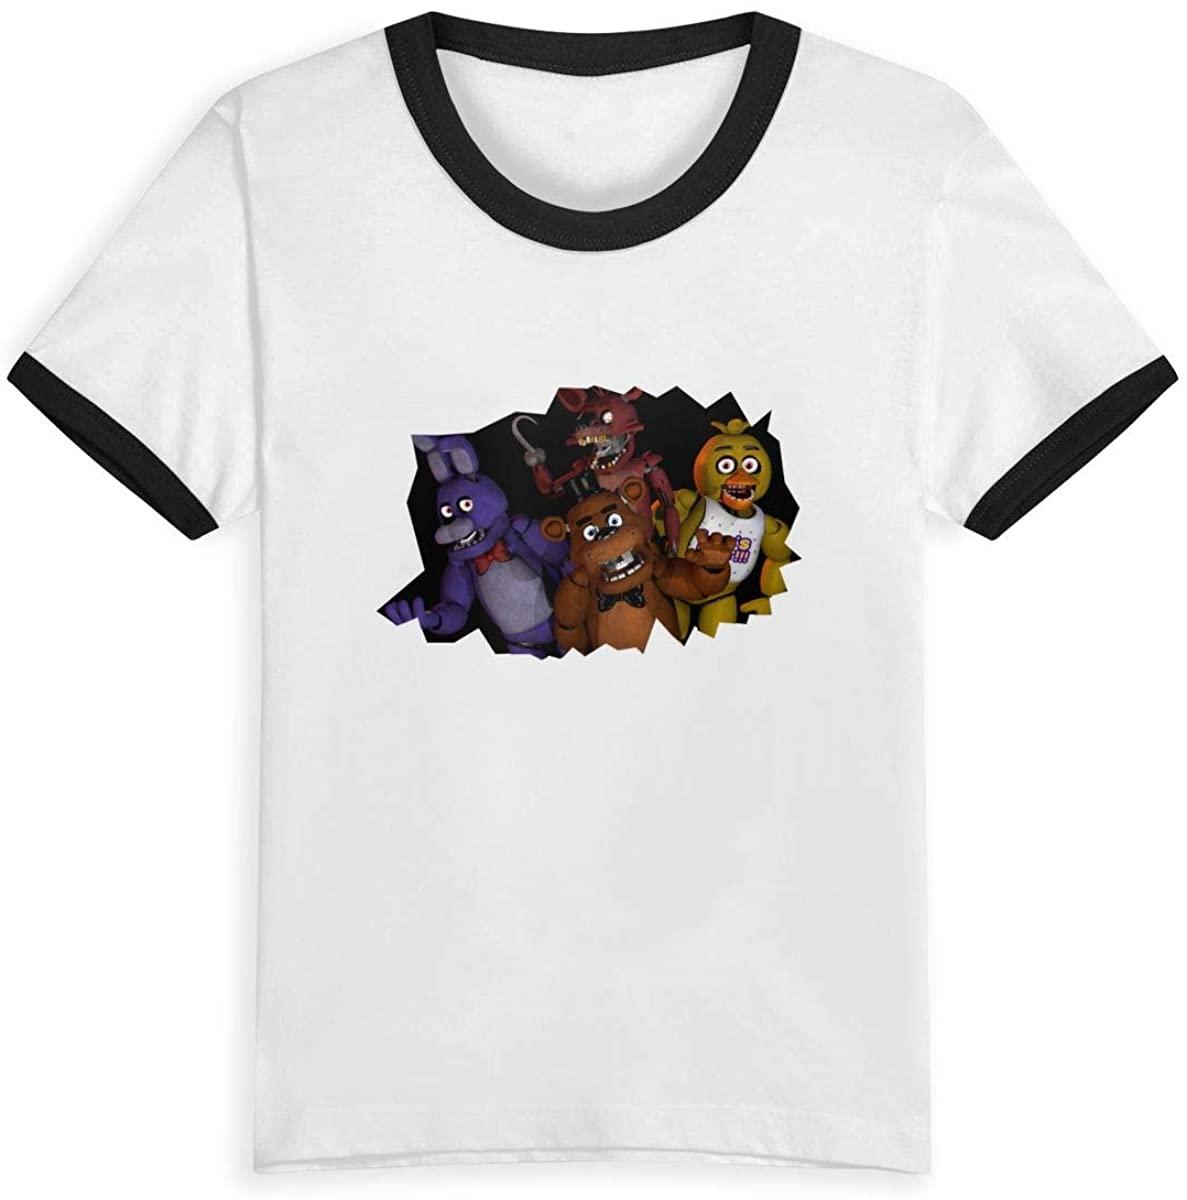 Five Nights at Freddy's Children's Cotton Cartoon Short Sleeve Cute Contrast T-Shirt